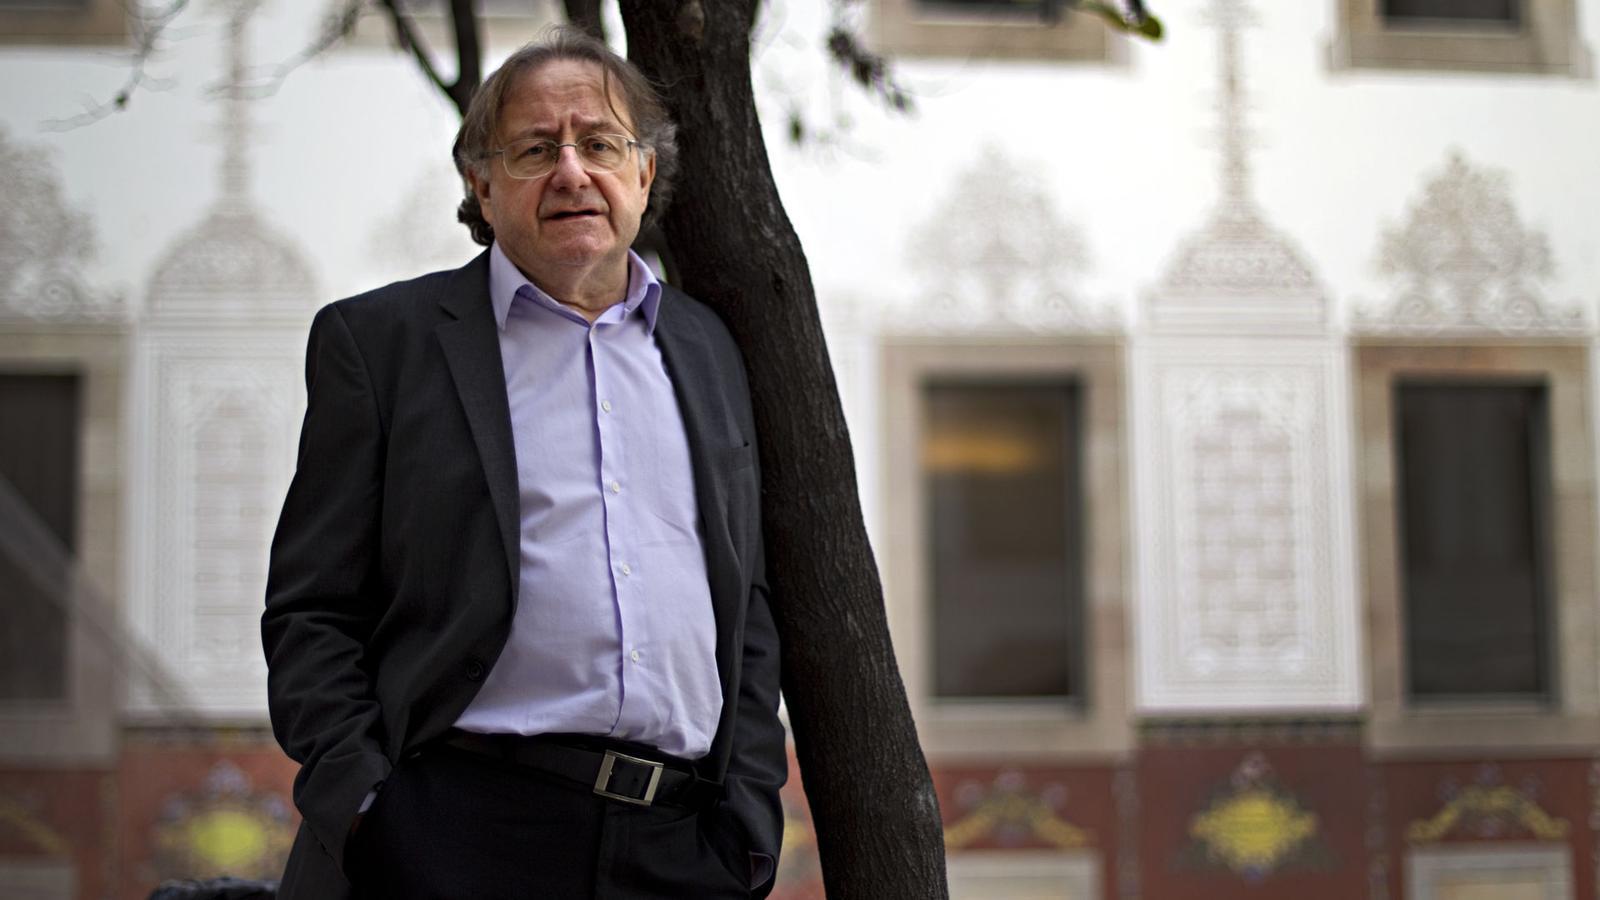 'La democràcia en perill', per Josep Ramoneda